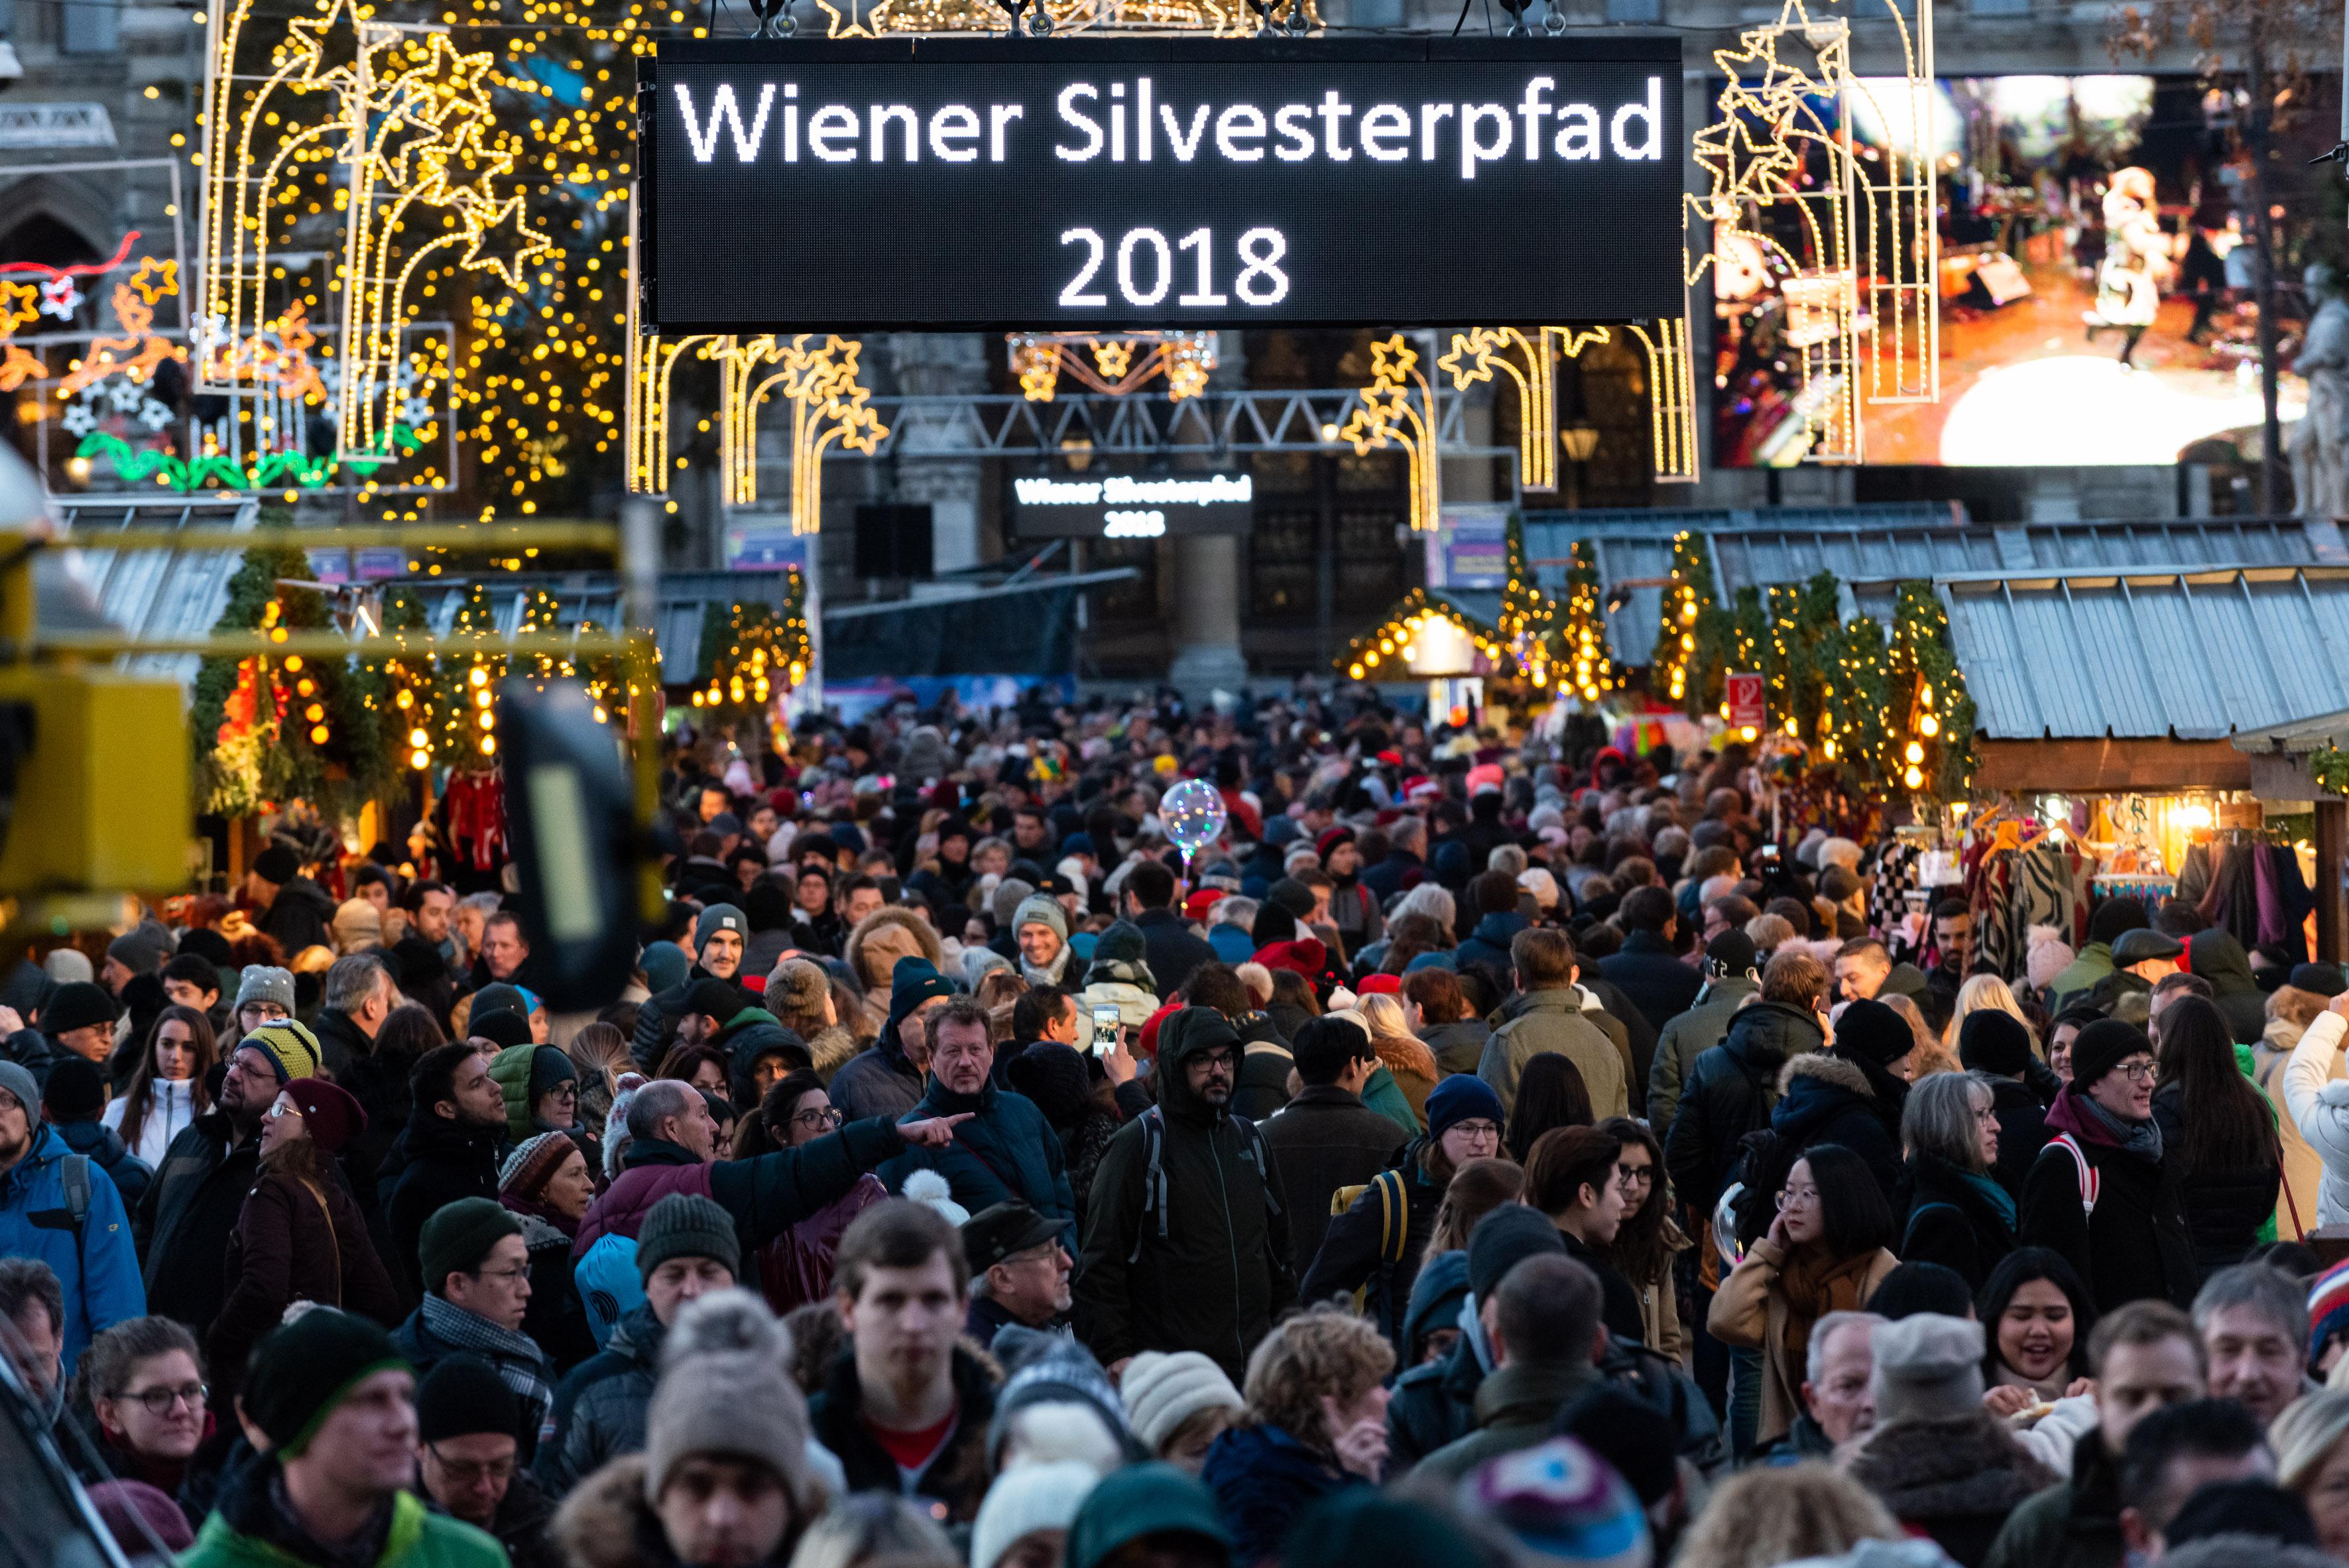 Silvesterpfad Rathausplatz